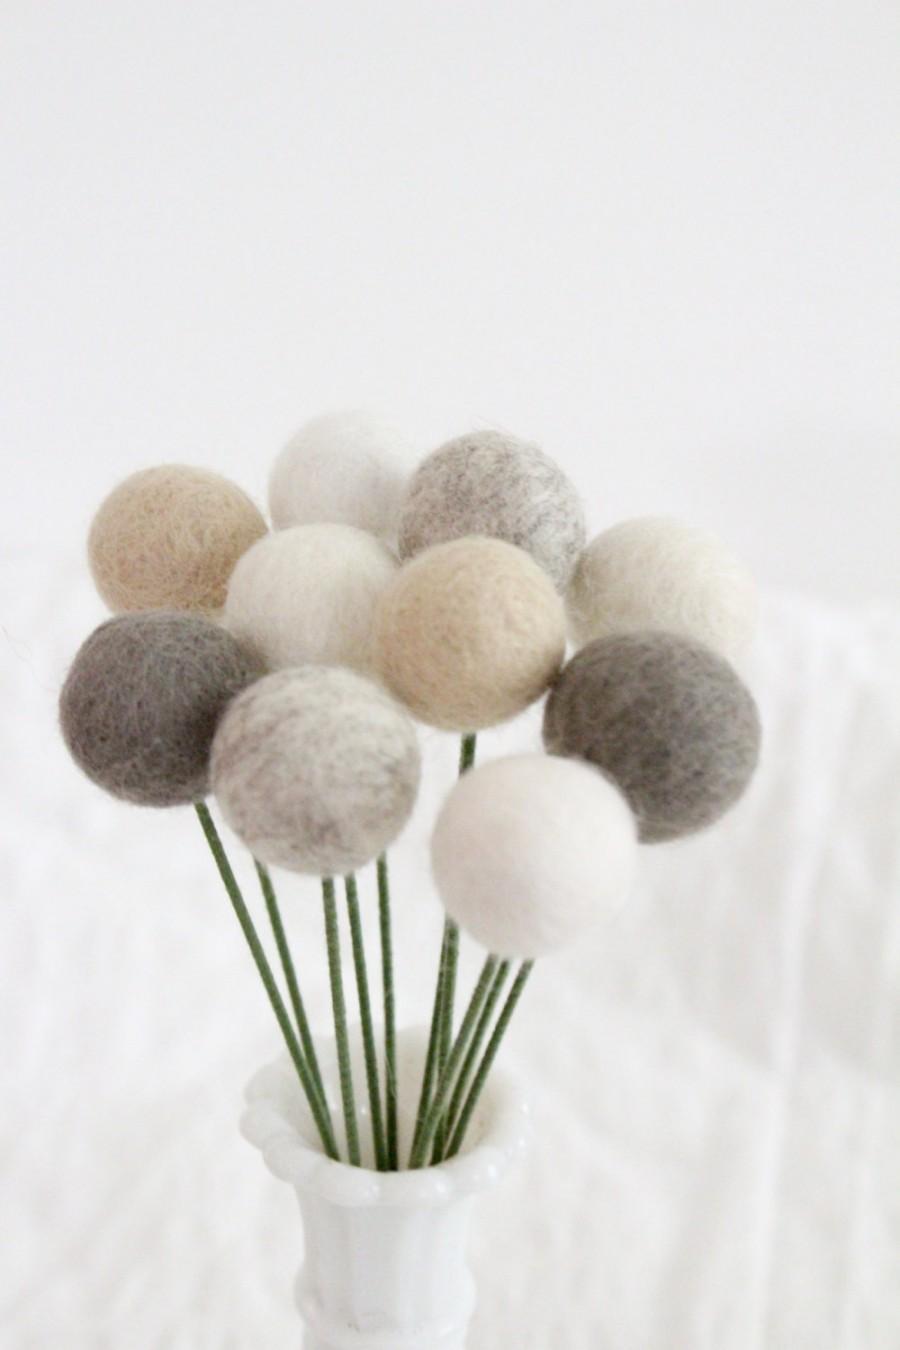 Свадьба - Farmhouse Felt Pom Pom Flowers- Billy Ball Flowers- Ivory Cream Gray- Bridesmaid bouquet- Flower bouquet- neutral wool pom poms- gray ivory